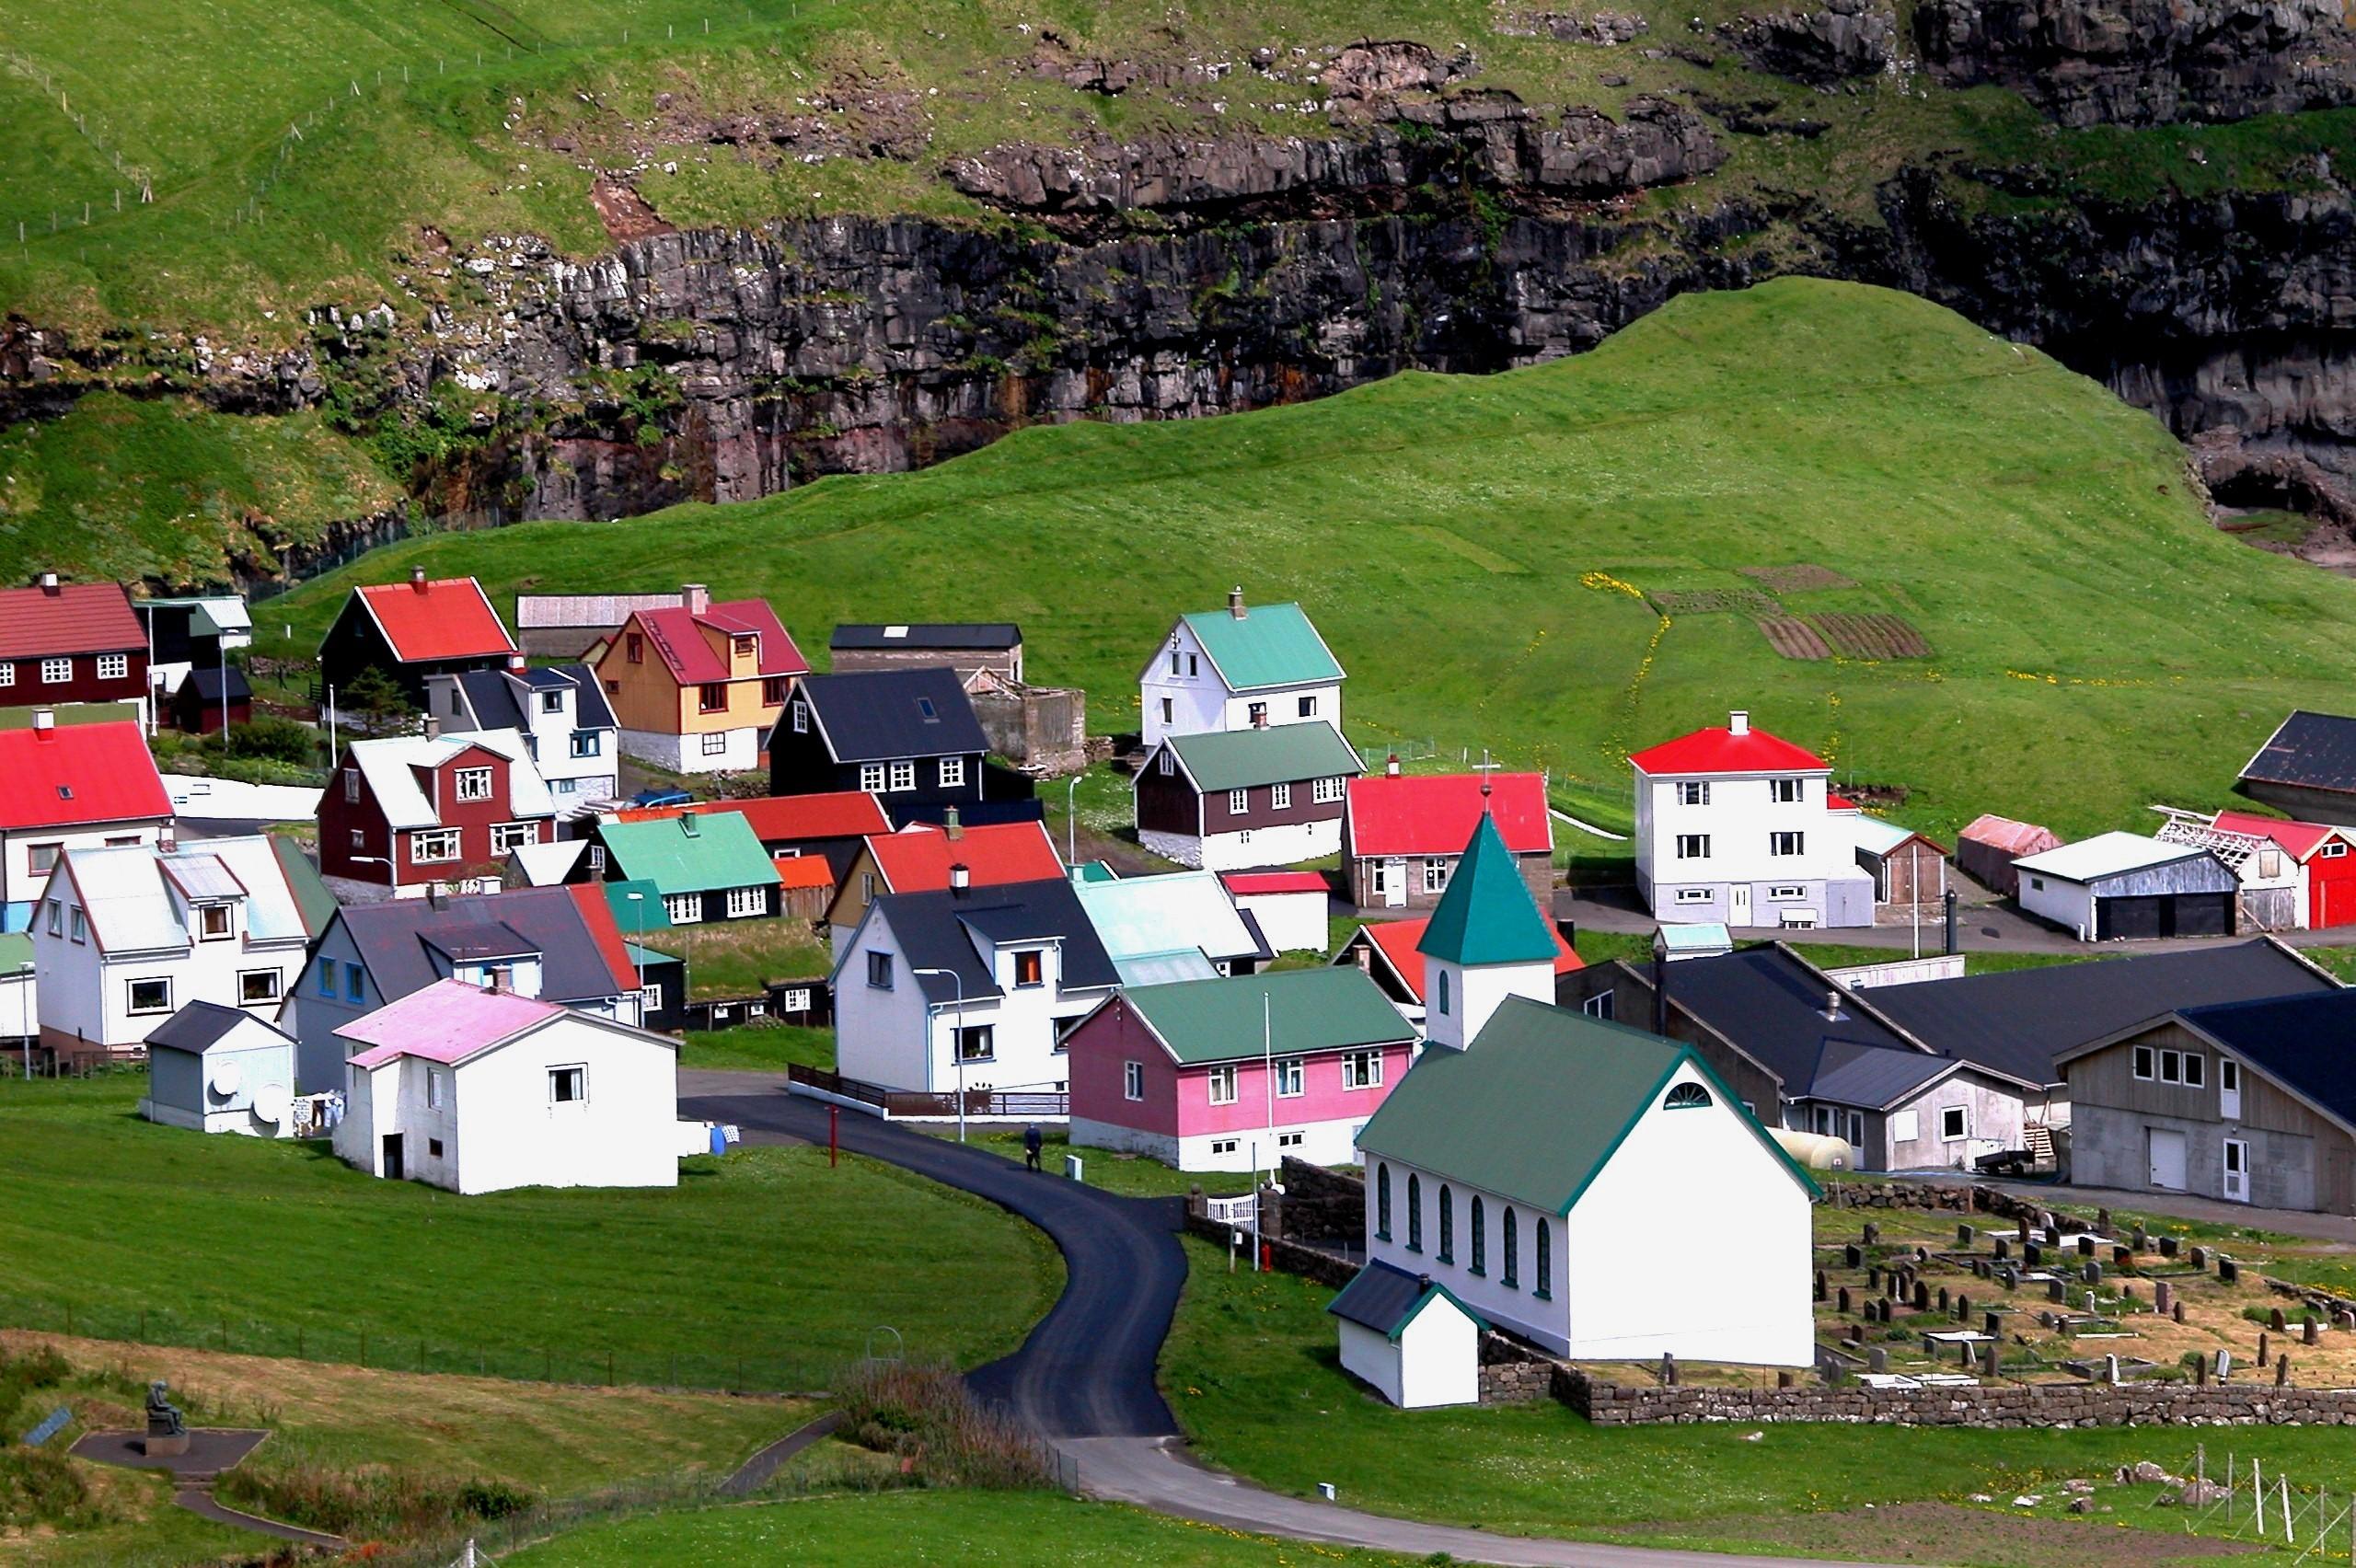 Gjógv, Eysturoy, Faroe Islands. Photo taken by Erik Christensen on June 20, 2005.